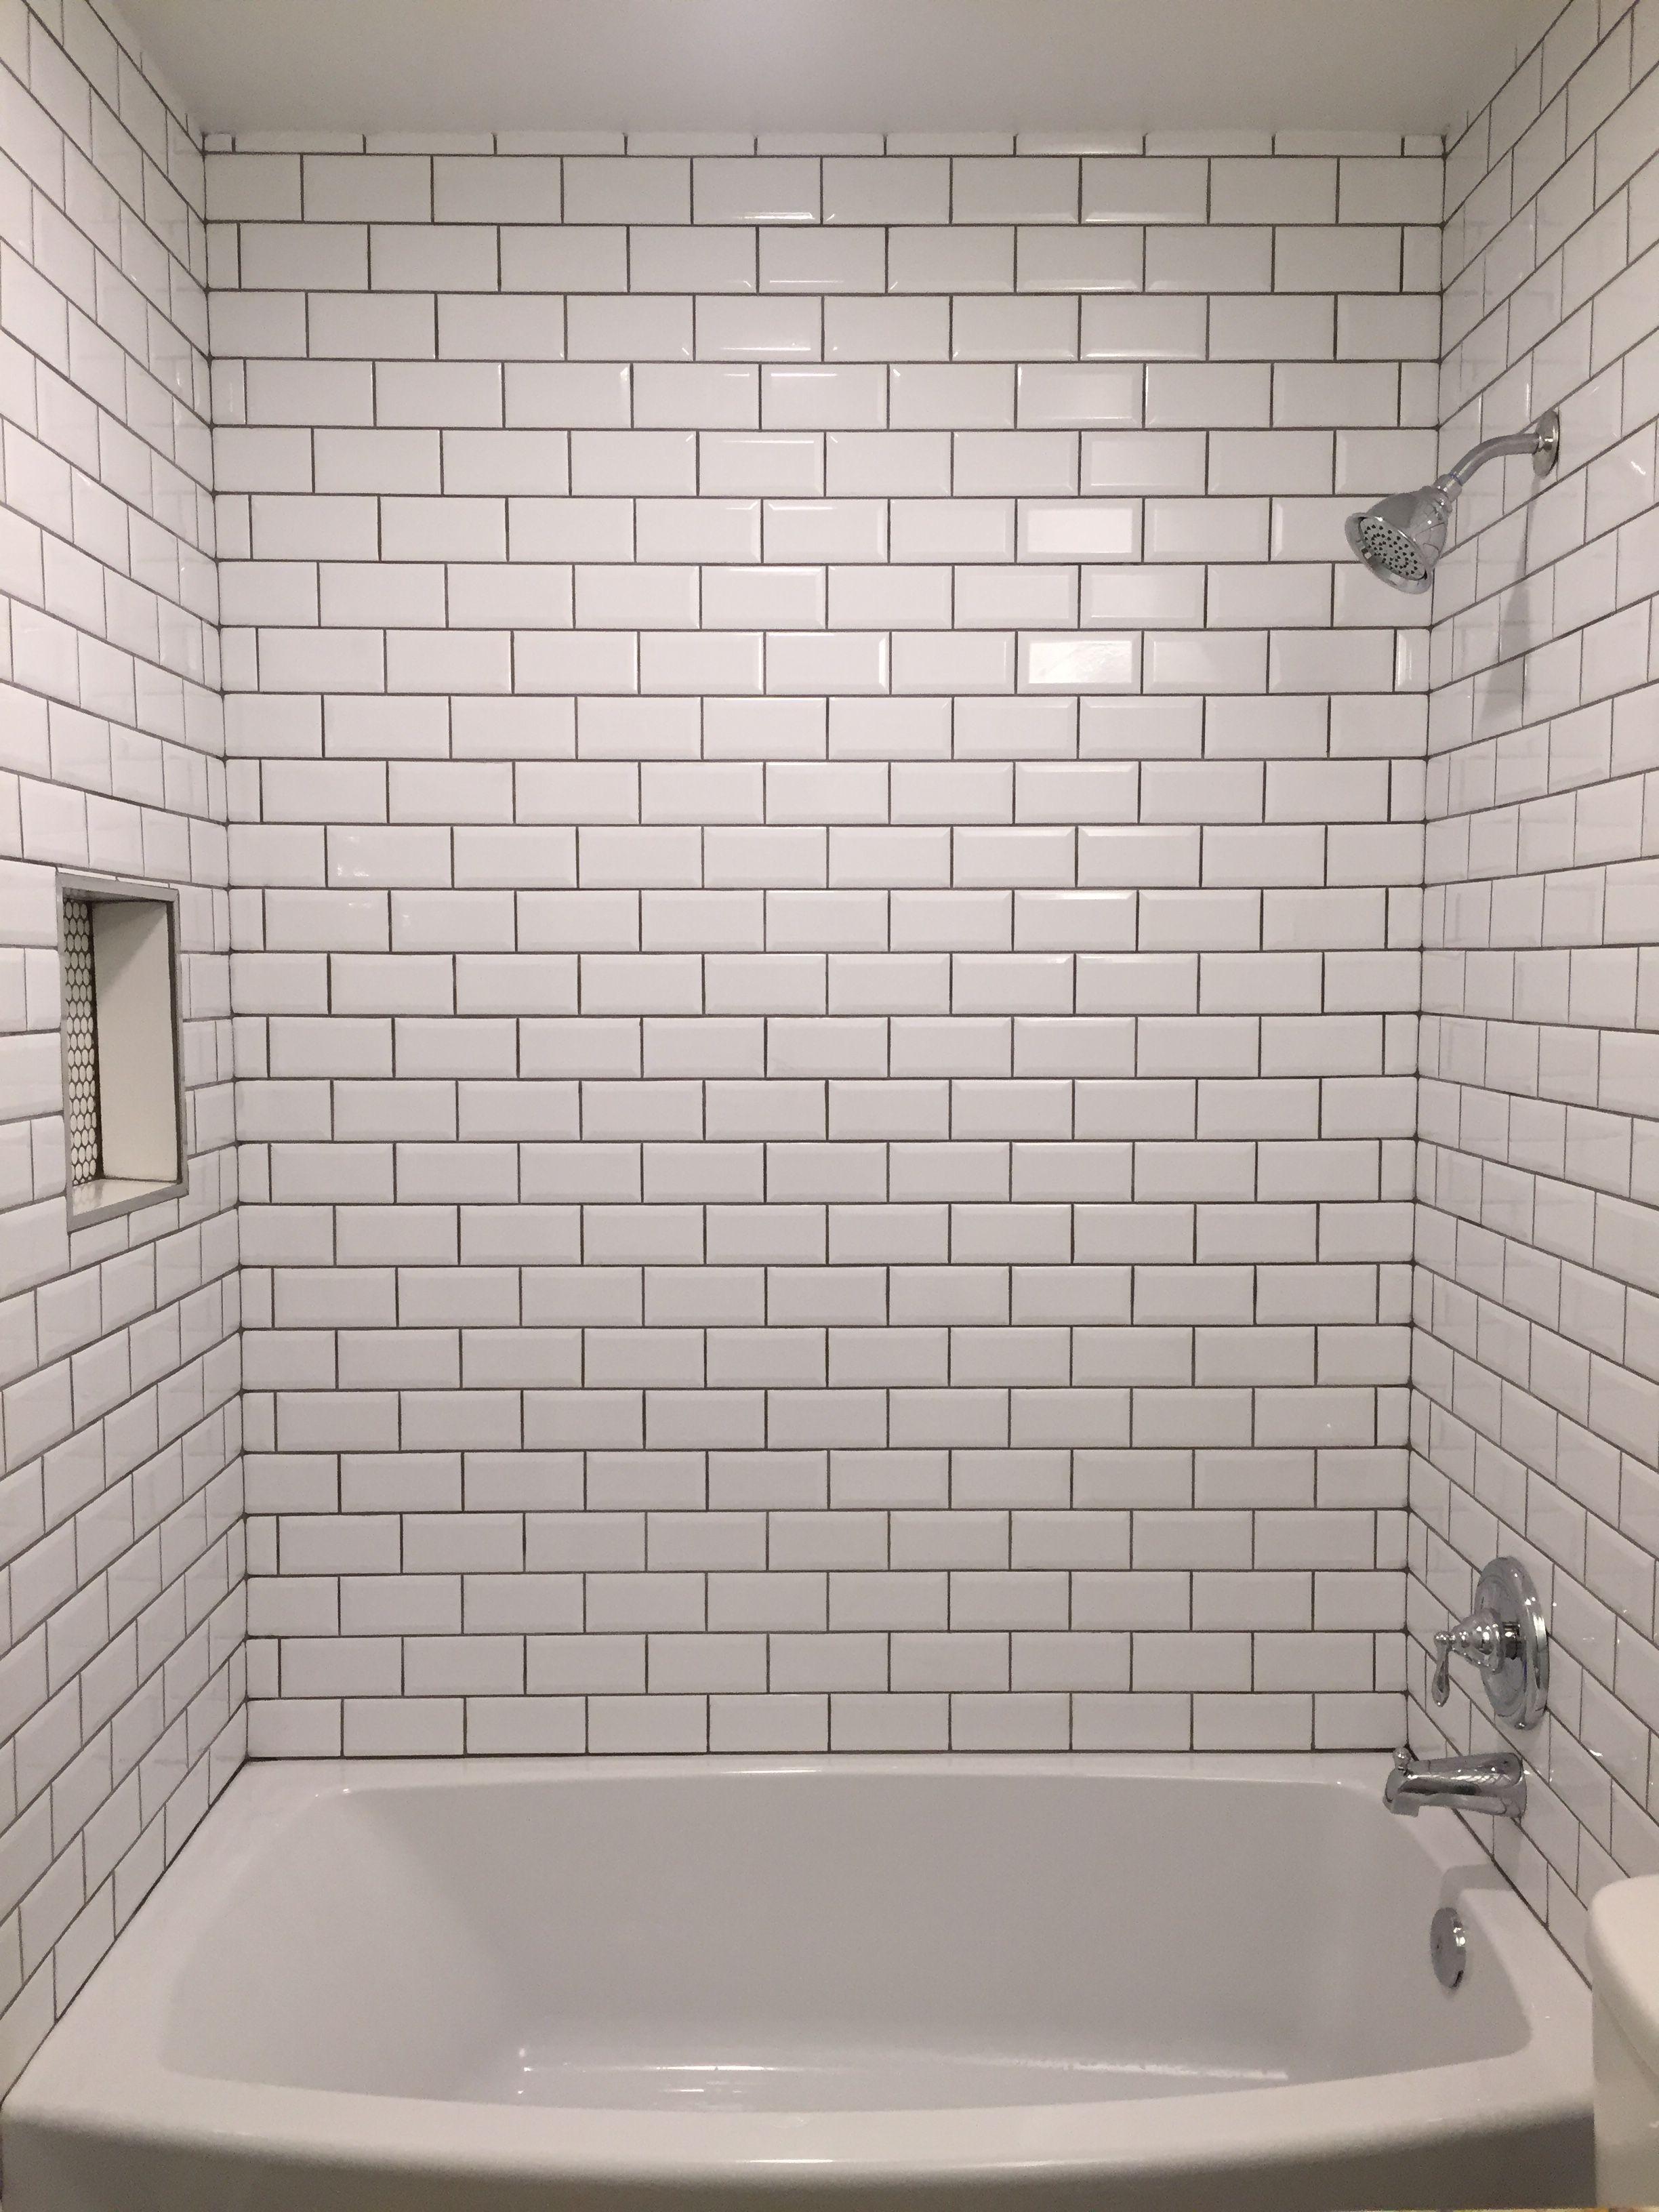 Beveled Bright White Subway Tile With Mapei Grey Grout White Subway Tile Bathroom Grey Grout Bathroom White Tiles Grey Grout